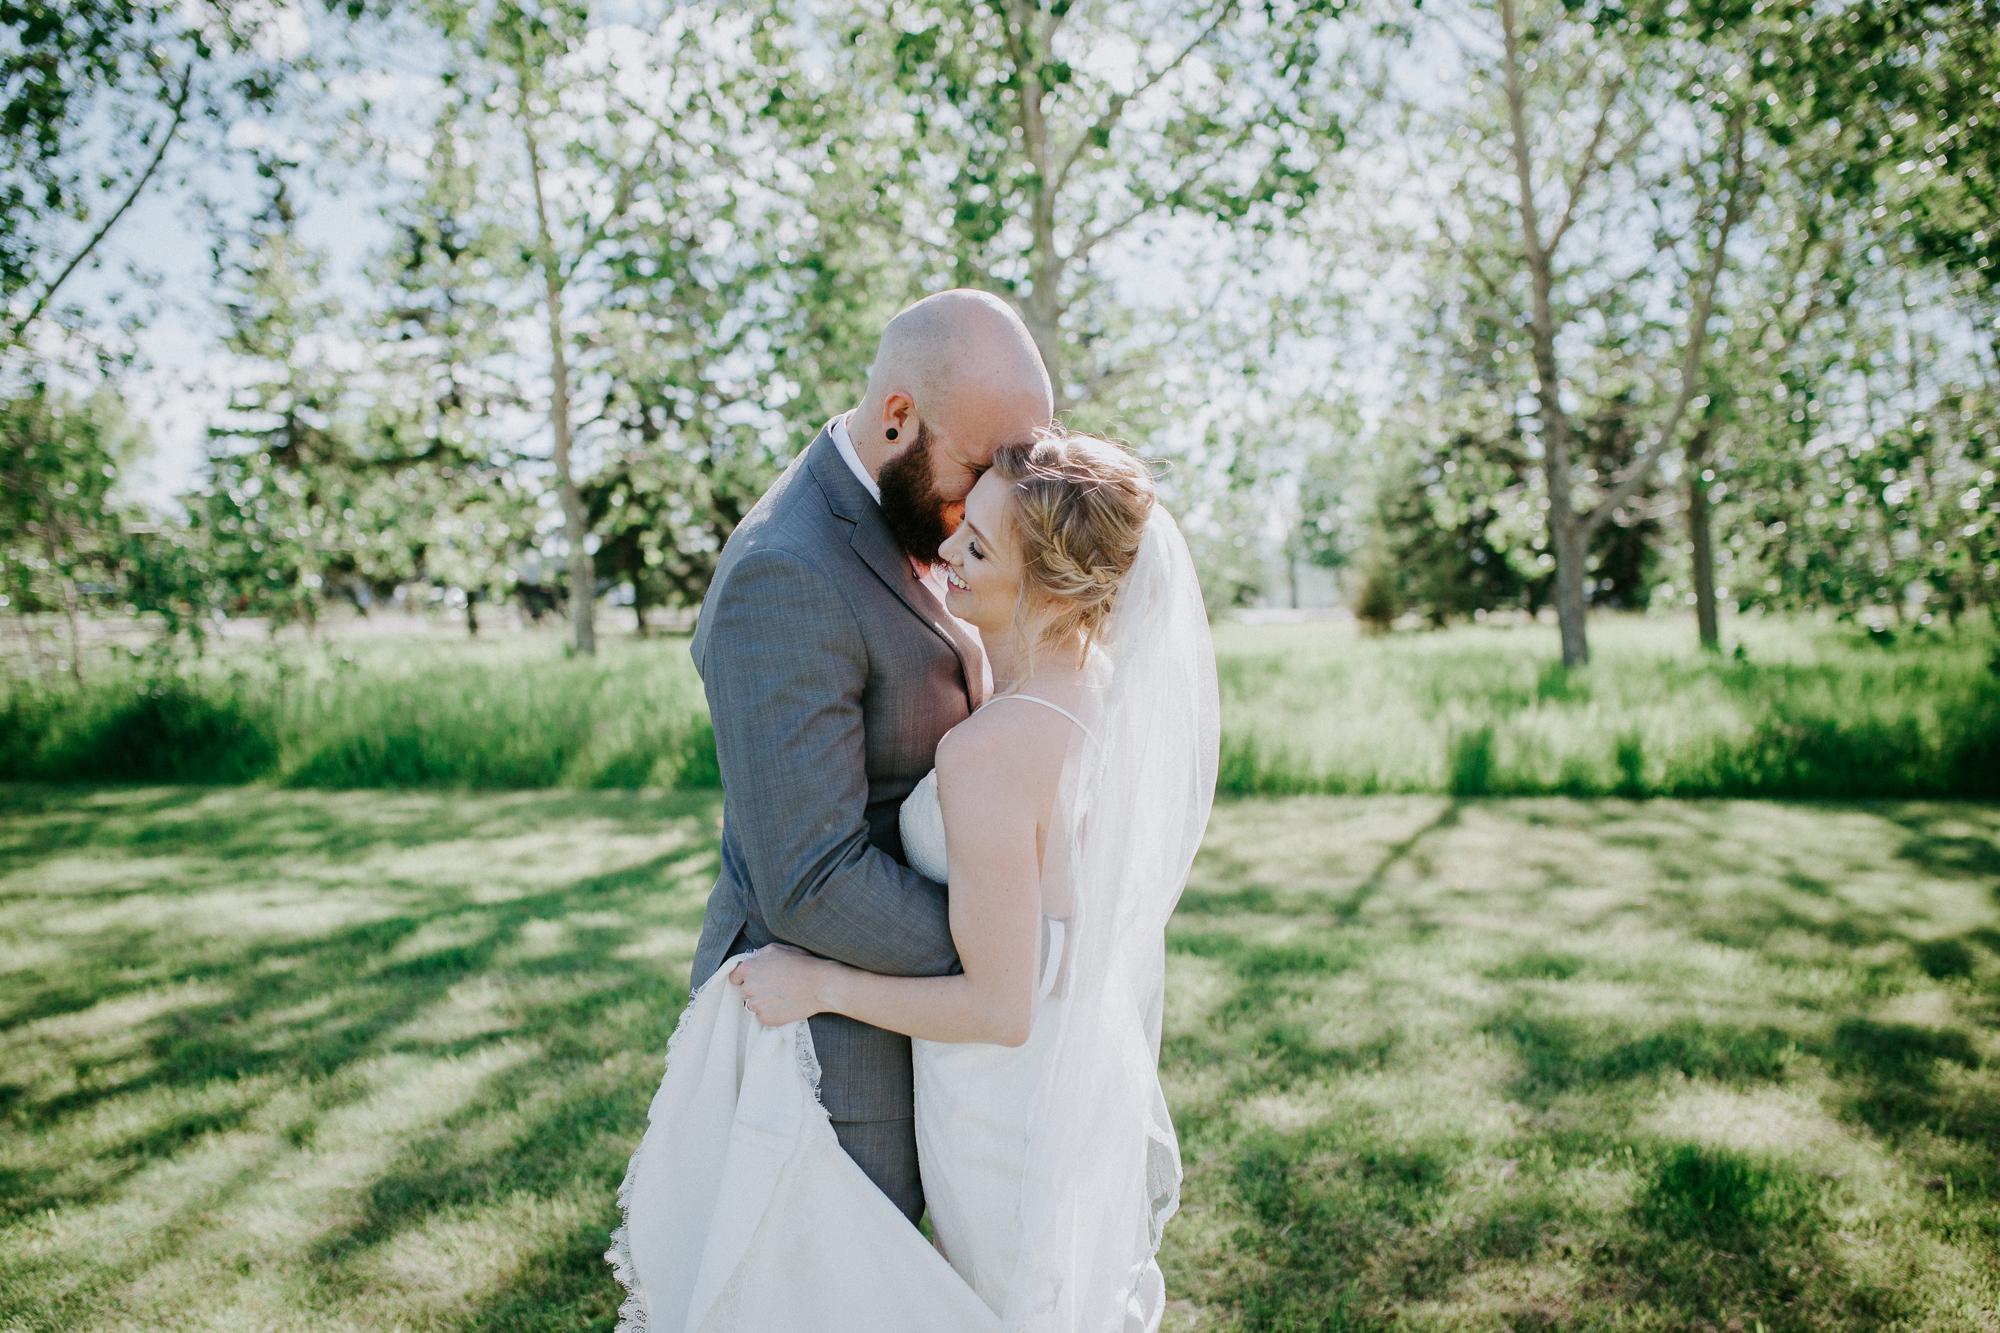 Calgary-wedding-photographer-am-73.jpg